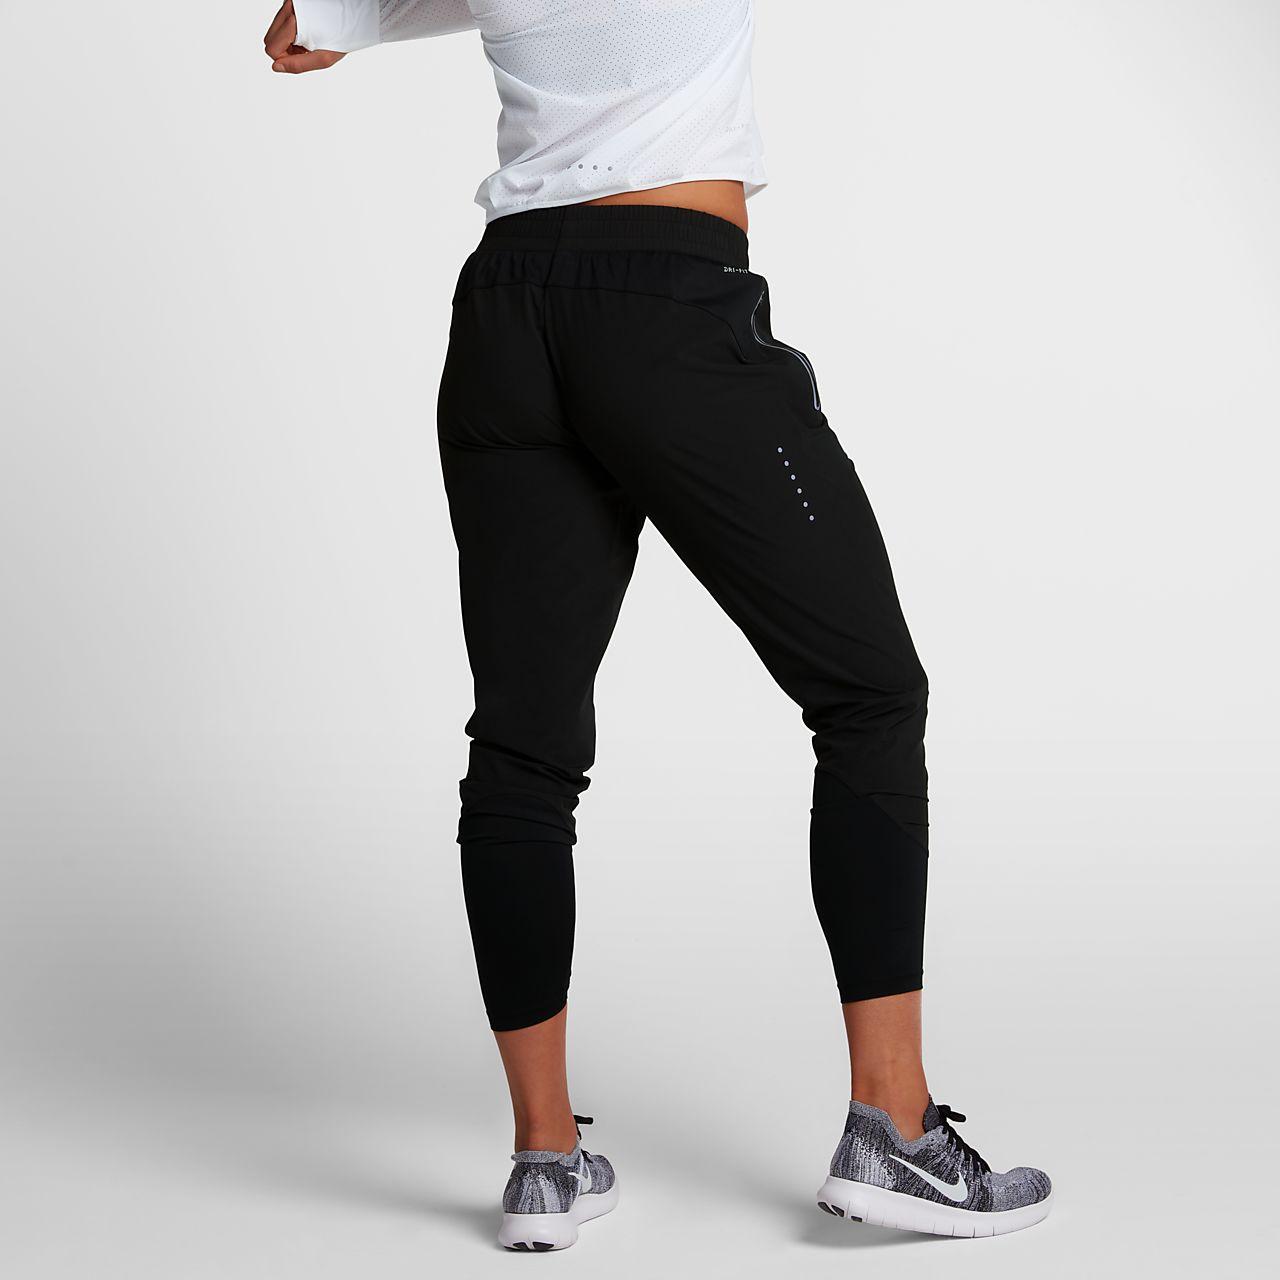 Amazing Nike Pants Women With Awesome Styles U2013 Playzoa.com